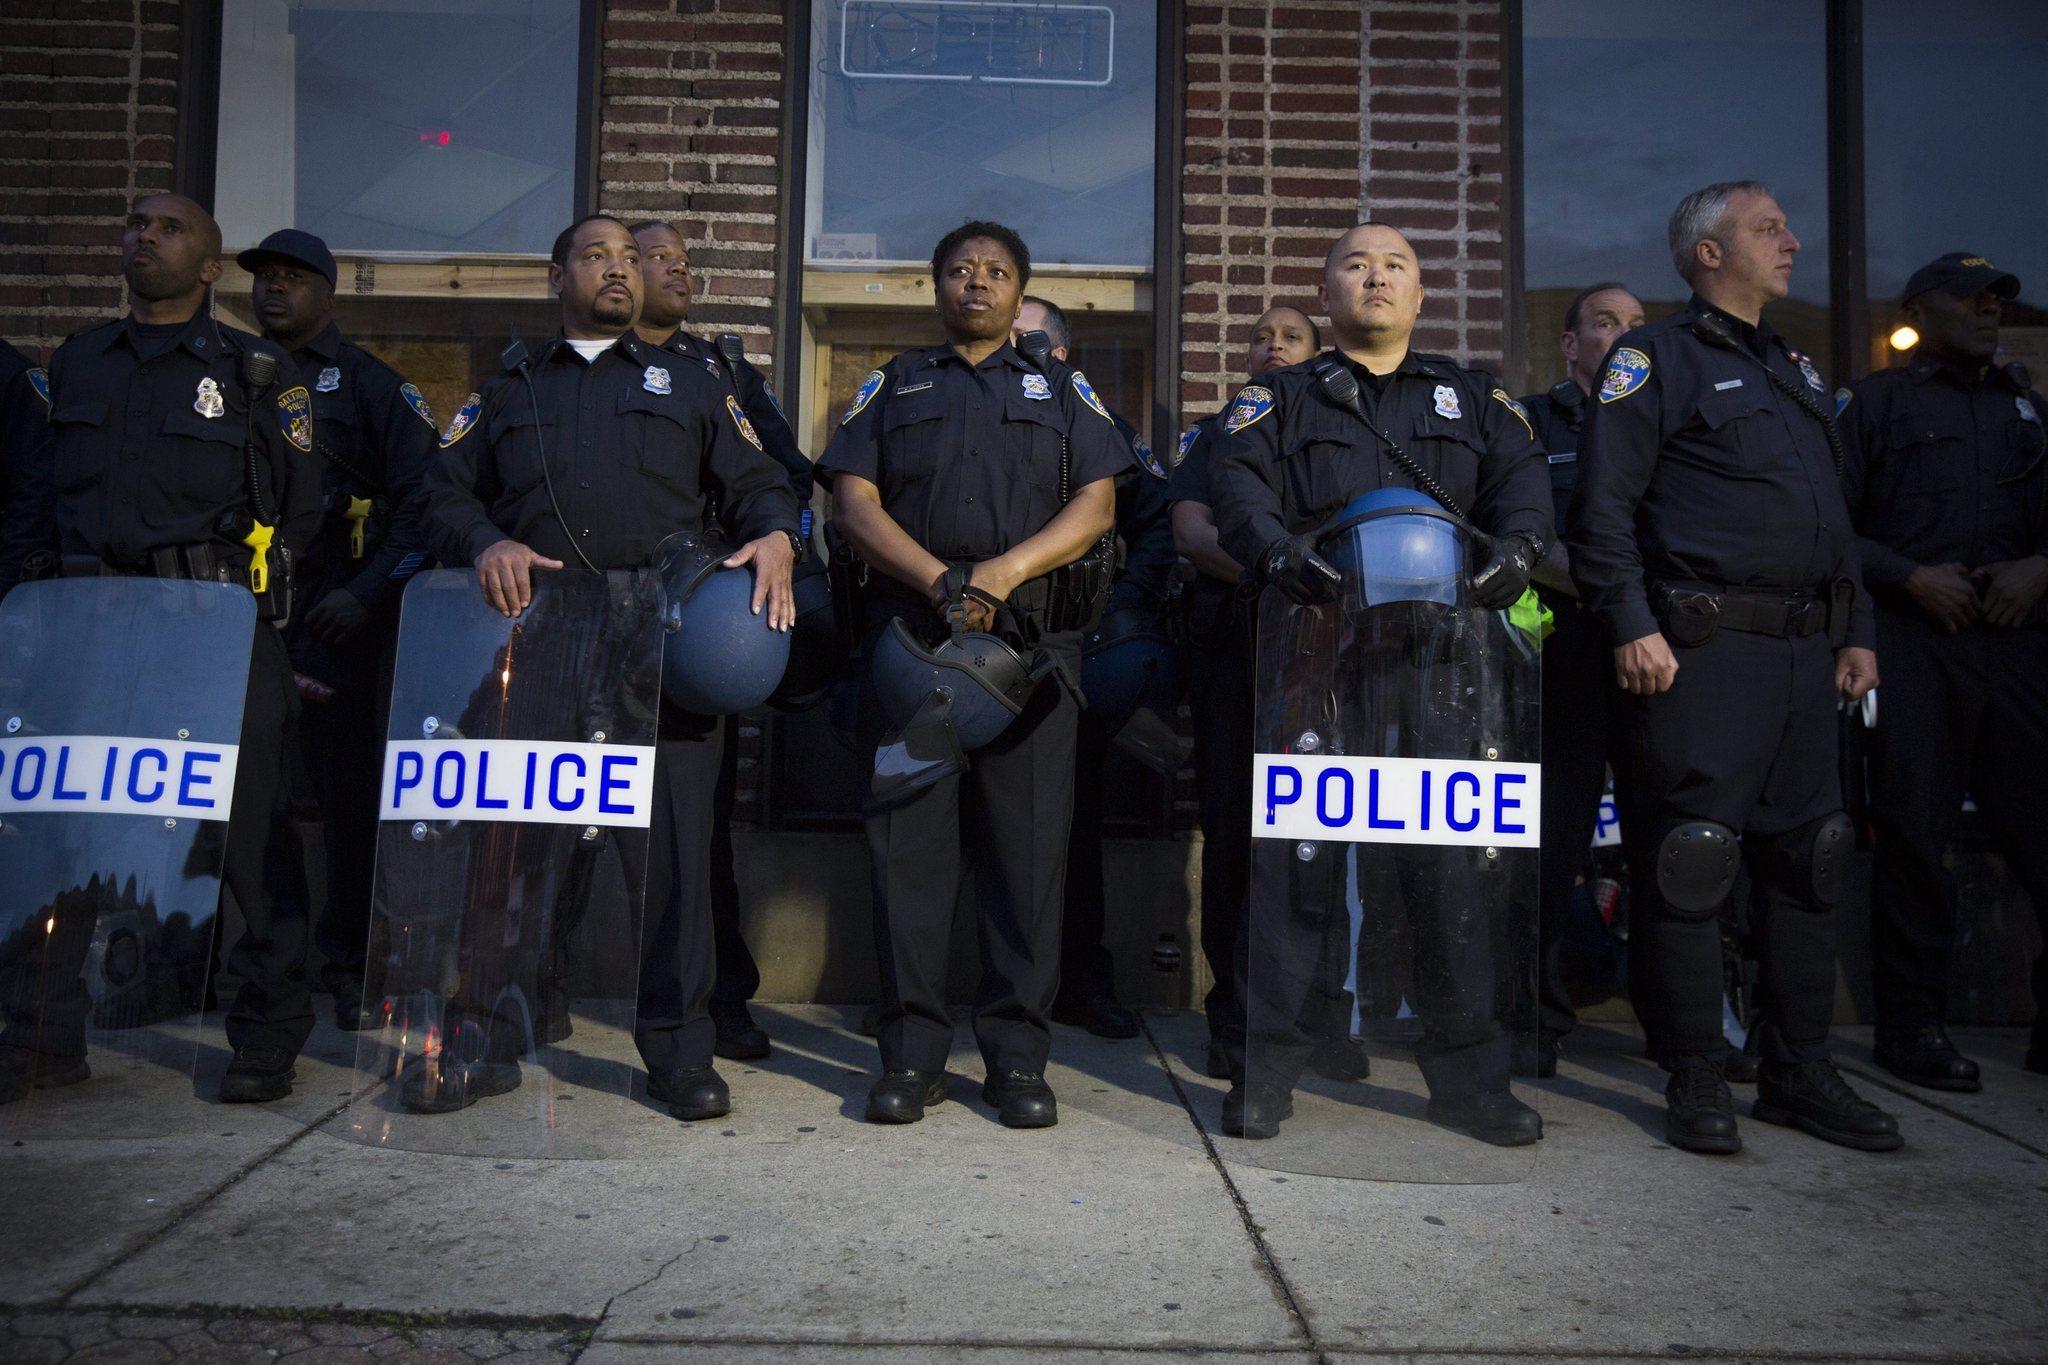 Members of Baltimore's police department. (Photo: John Taggart, EPA)